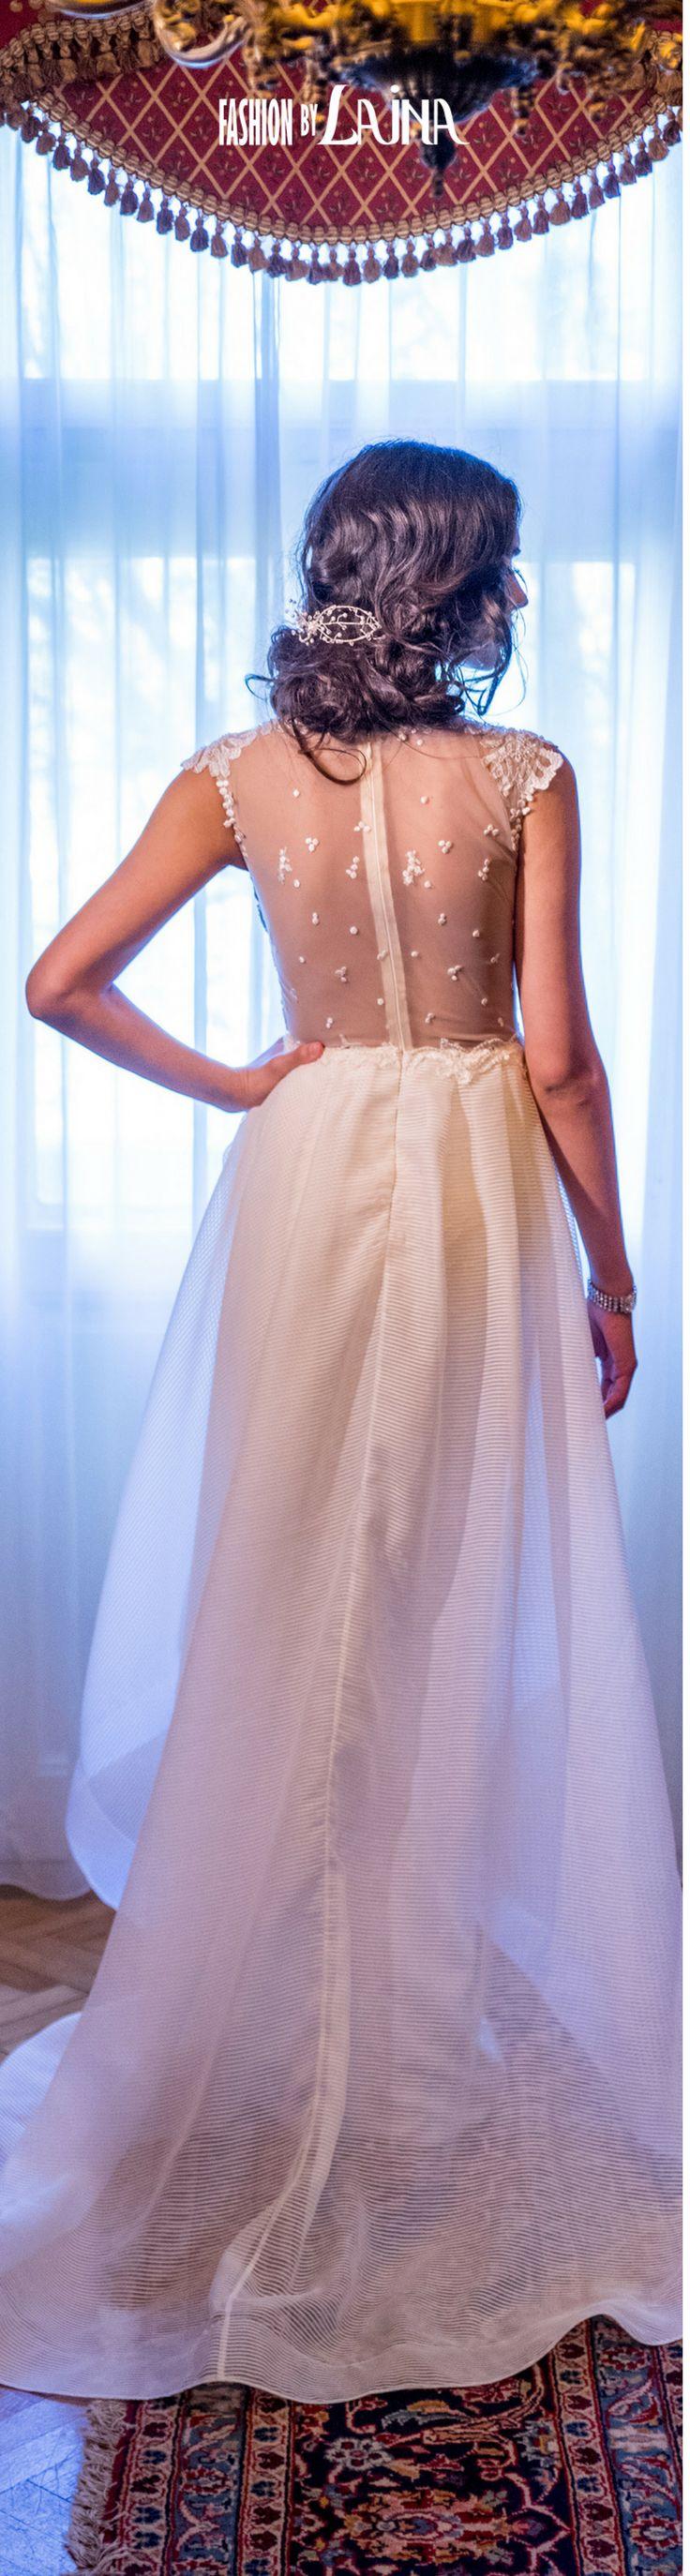 2018 Wedding Dress Fashion by Laina Bridal. See more at https://www.fashionbylaina.eu/reve-de-fleur/